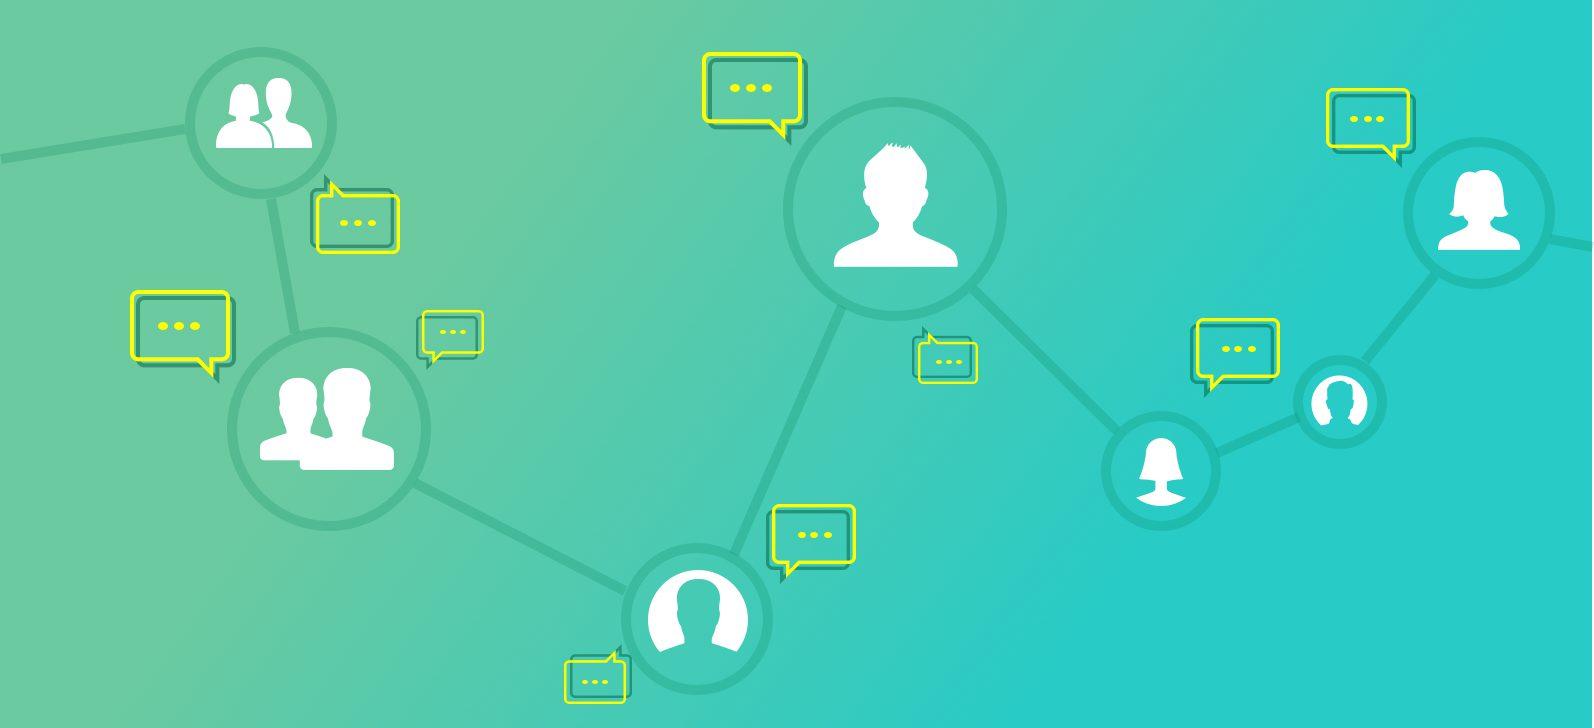 Upgrading your Digital Marketing with StoryBrand blog post image@2x